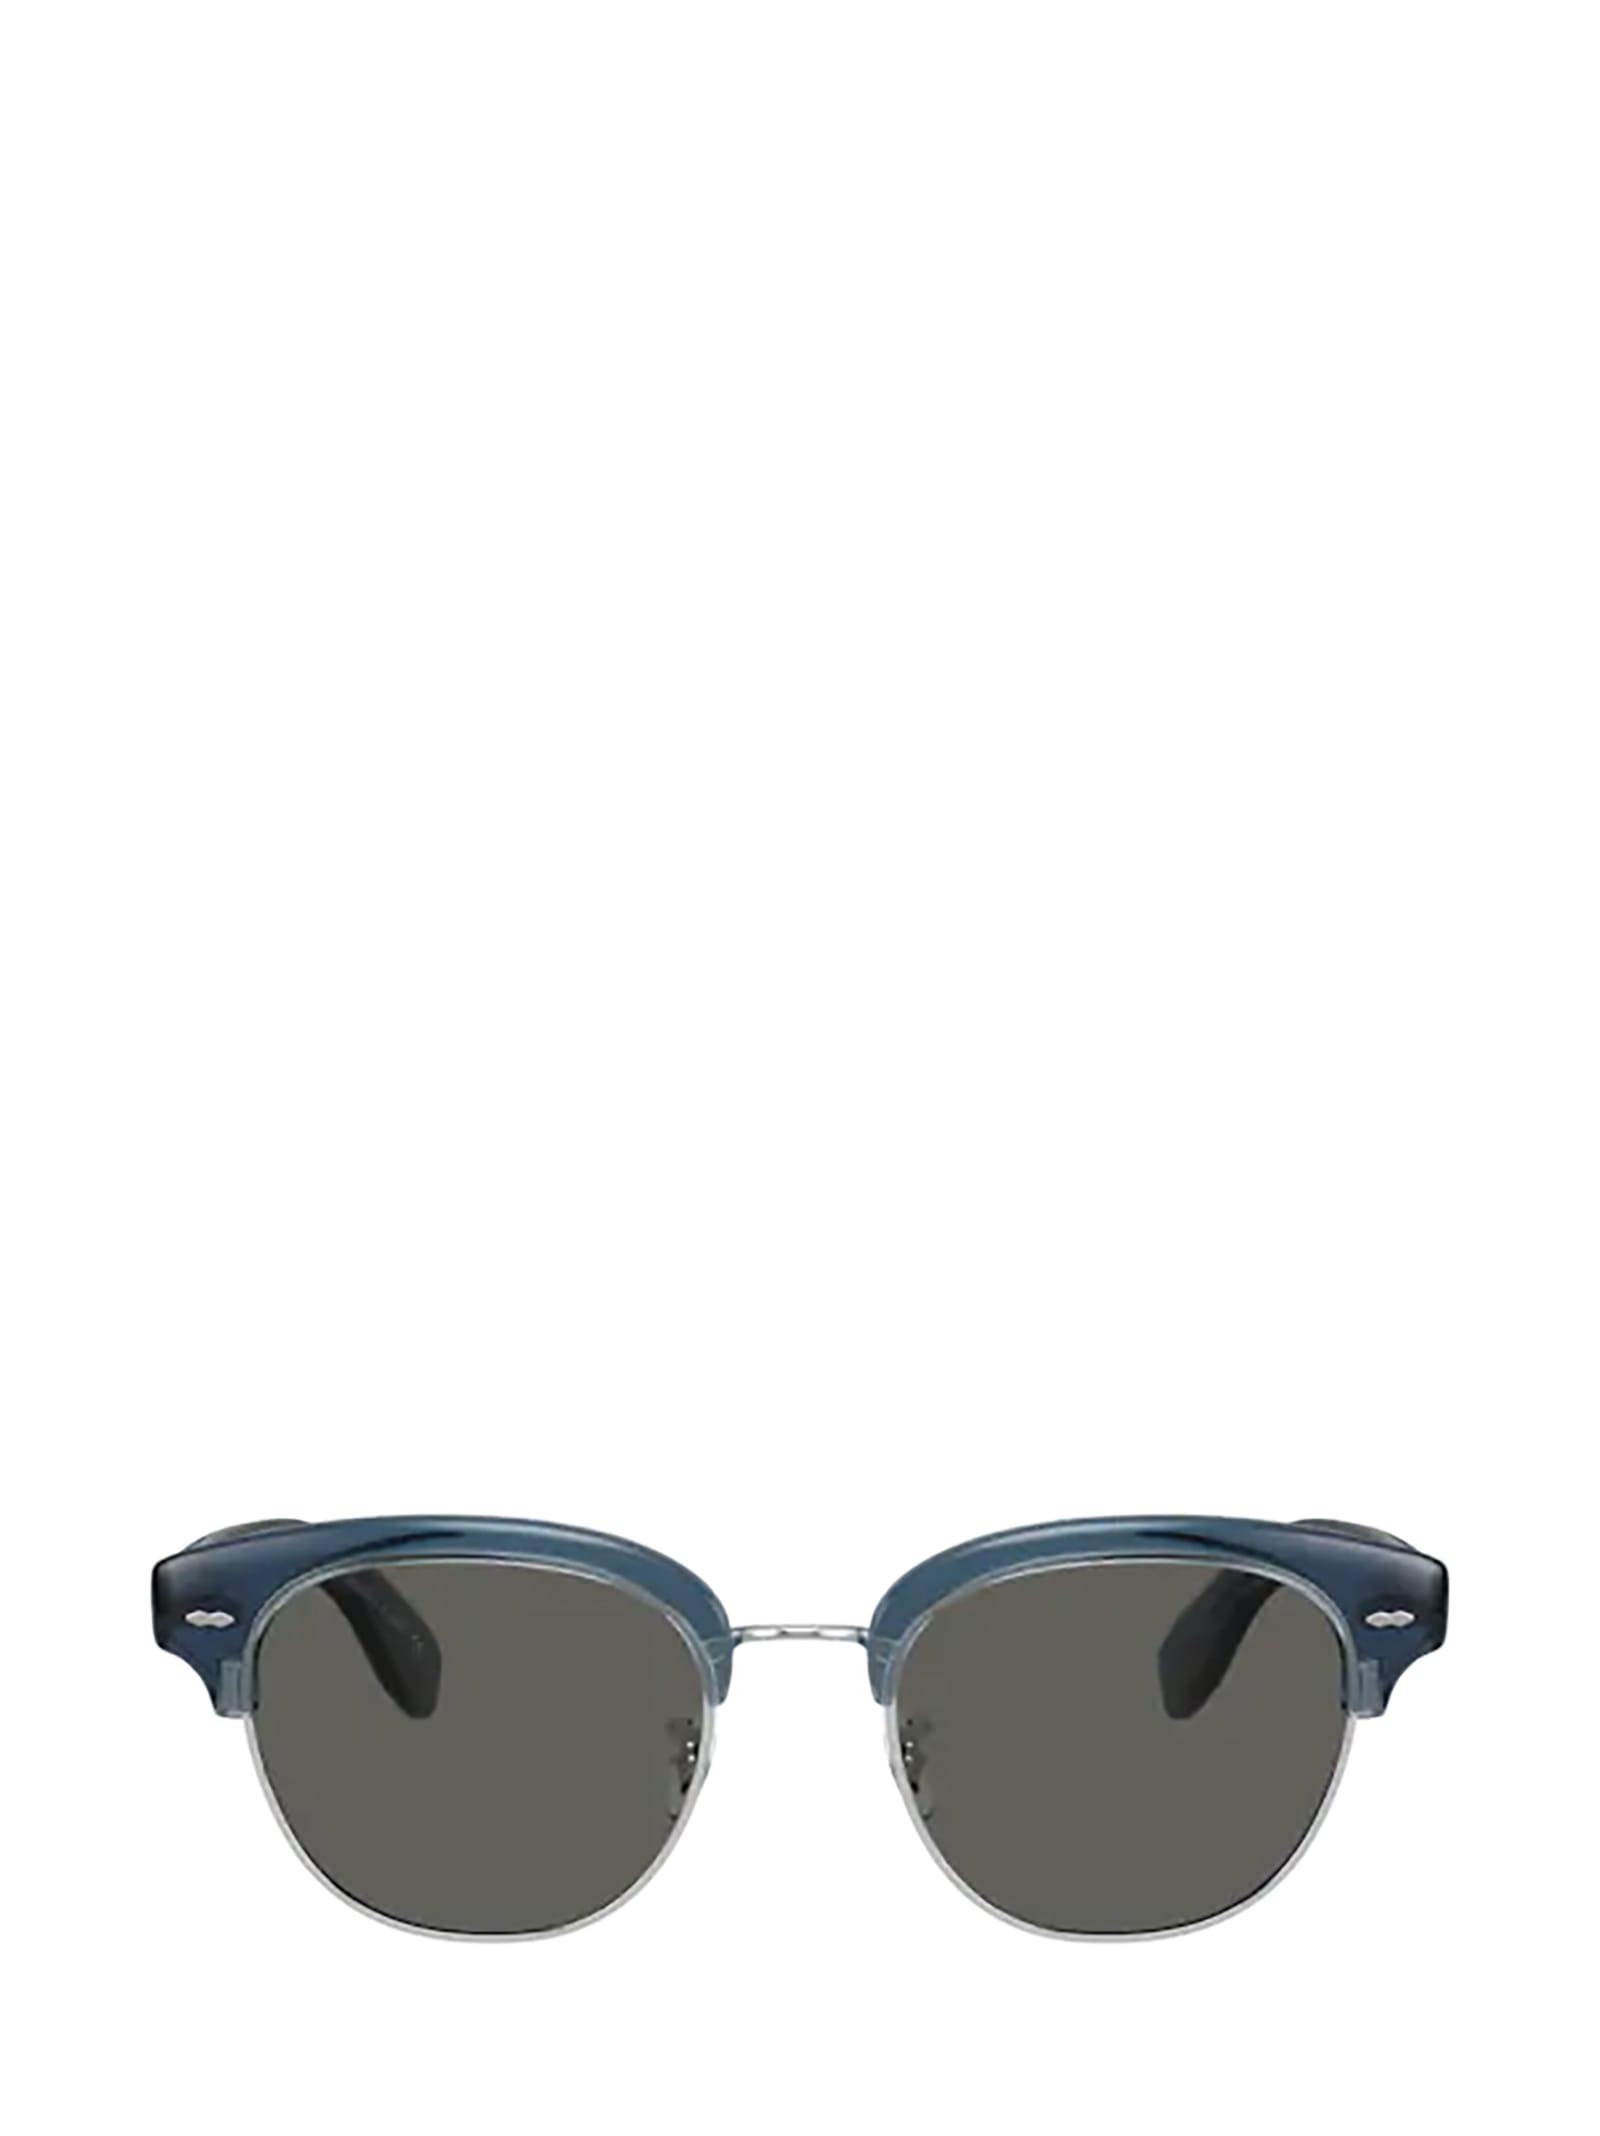 Oliver Peoples Oliver Peoples Ov5436s Deep Blue Sunglasses